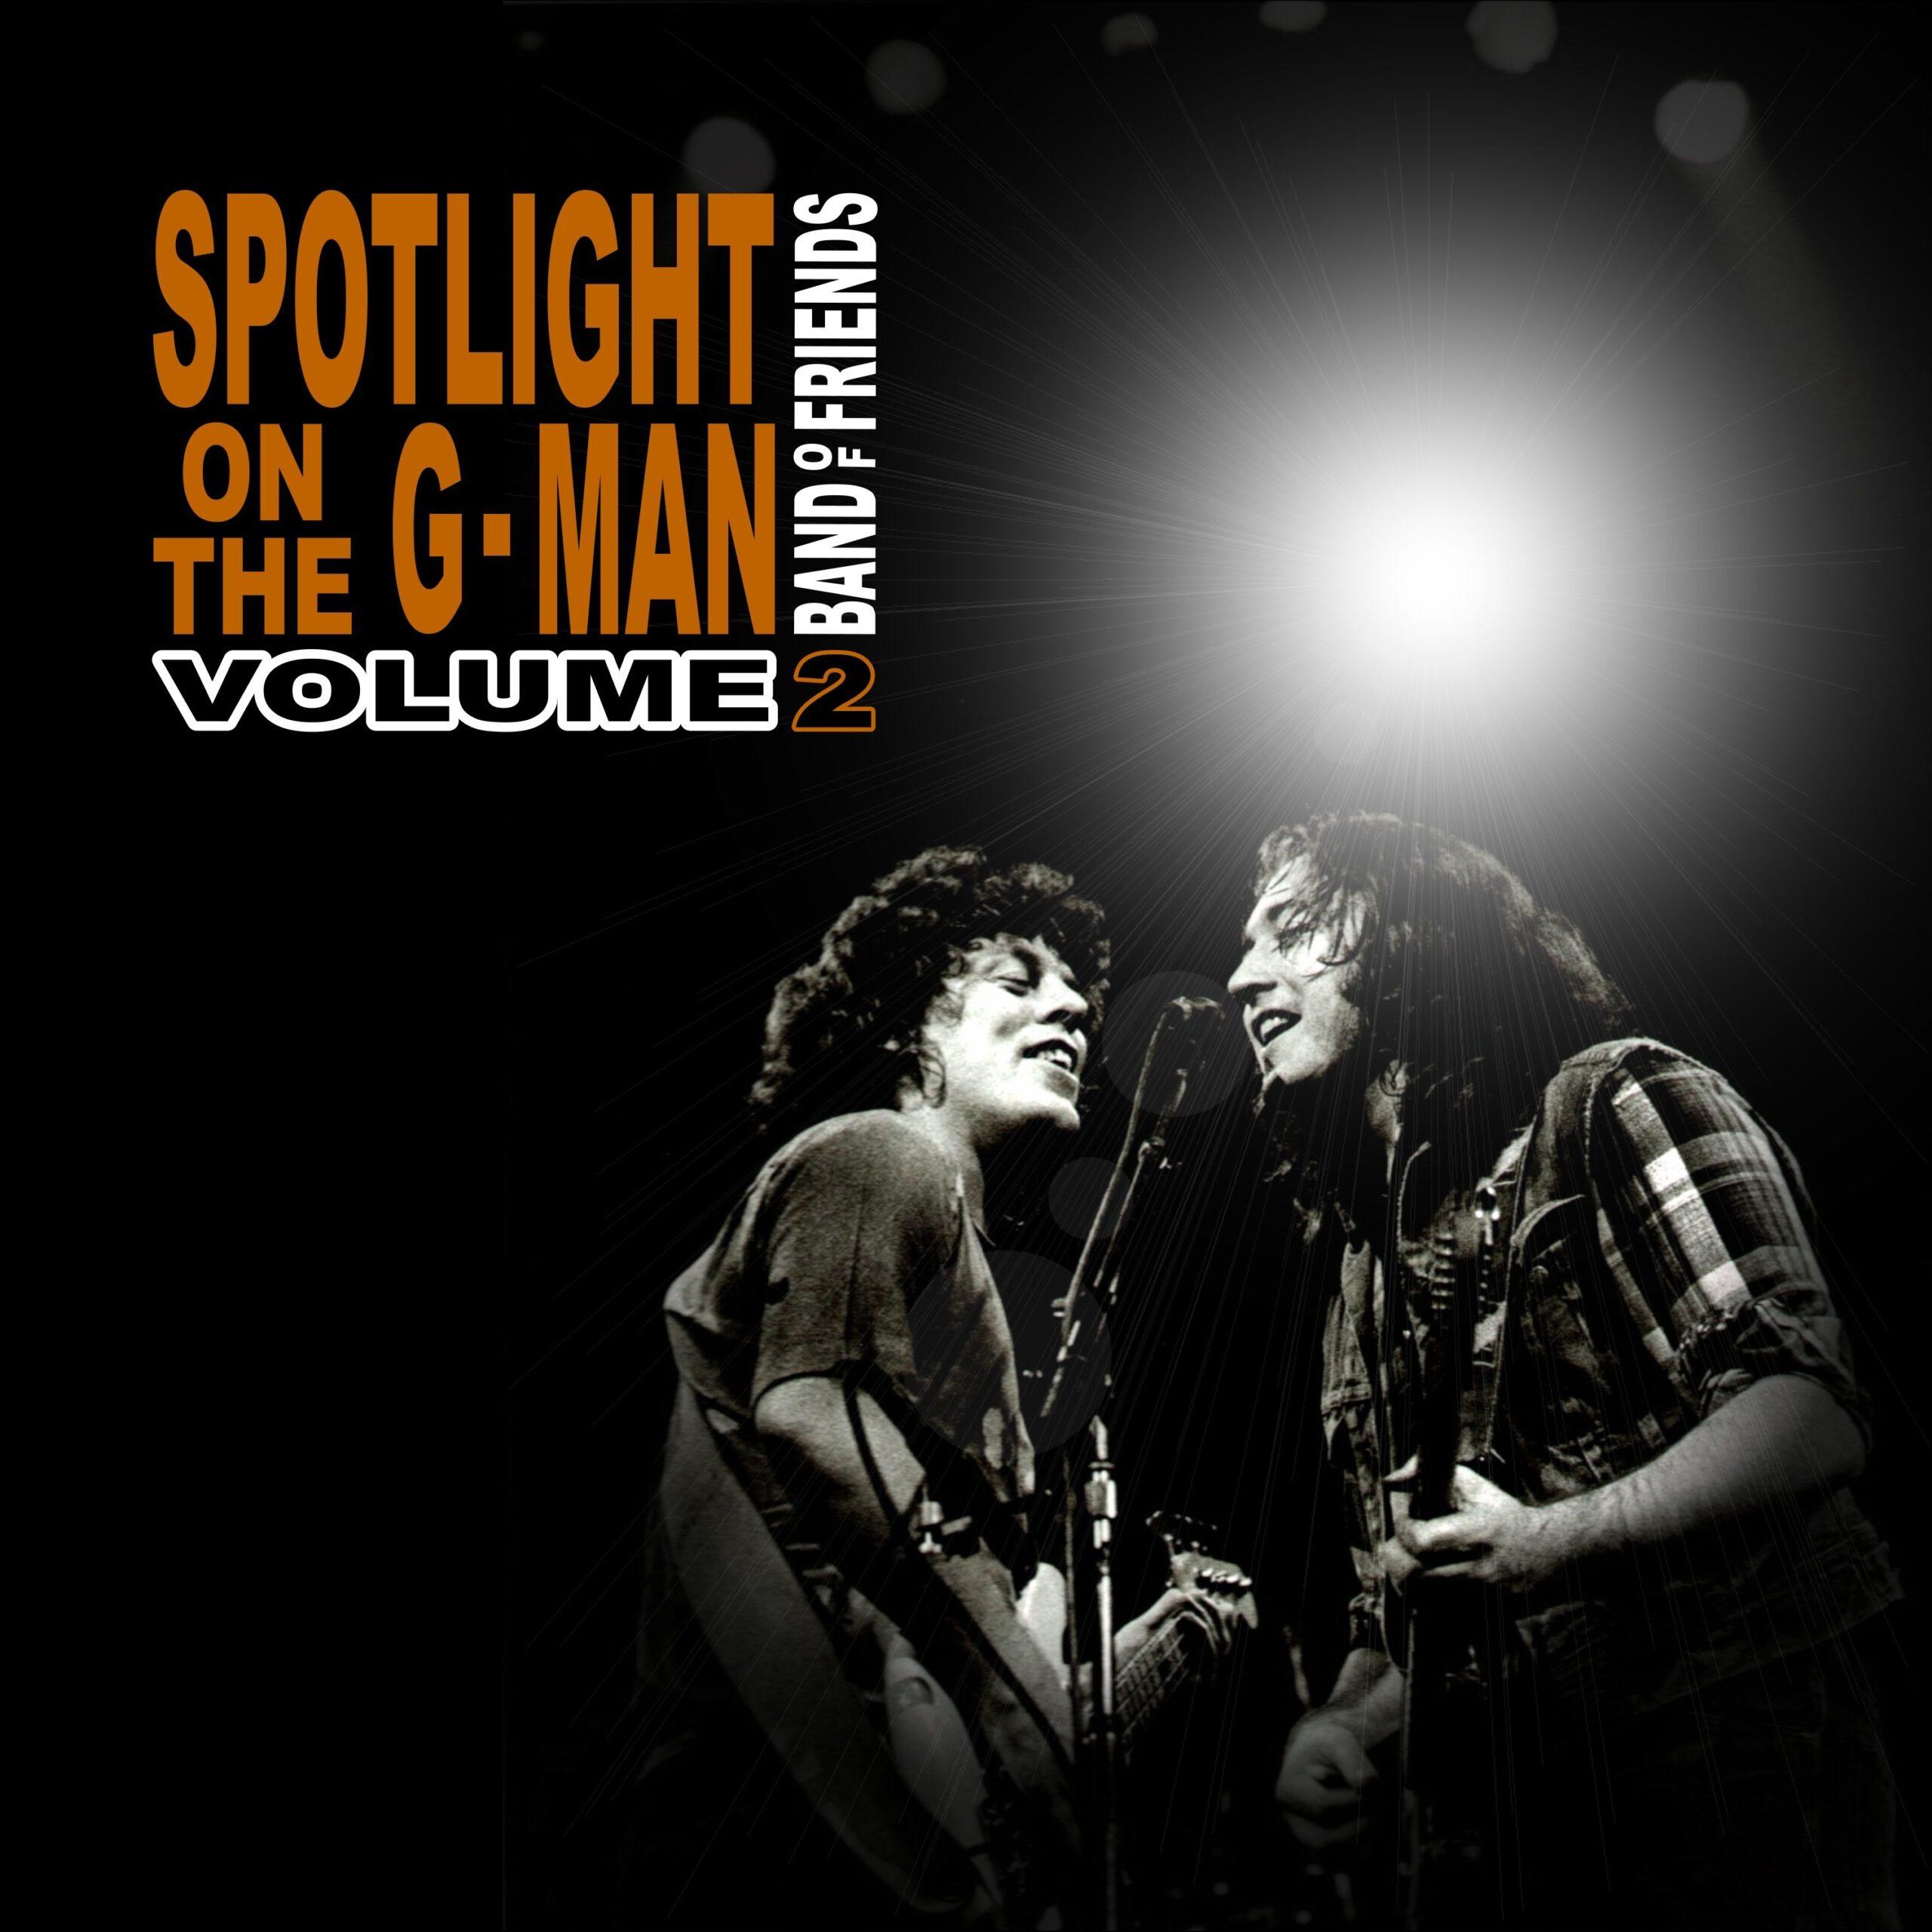 Band Of Friends - Spotlight On The G Man Volume 2